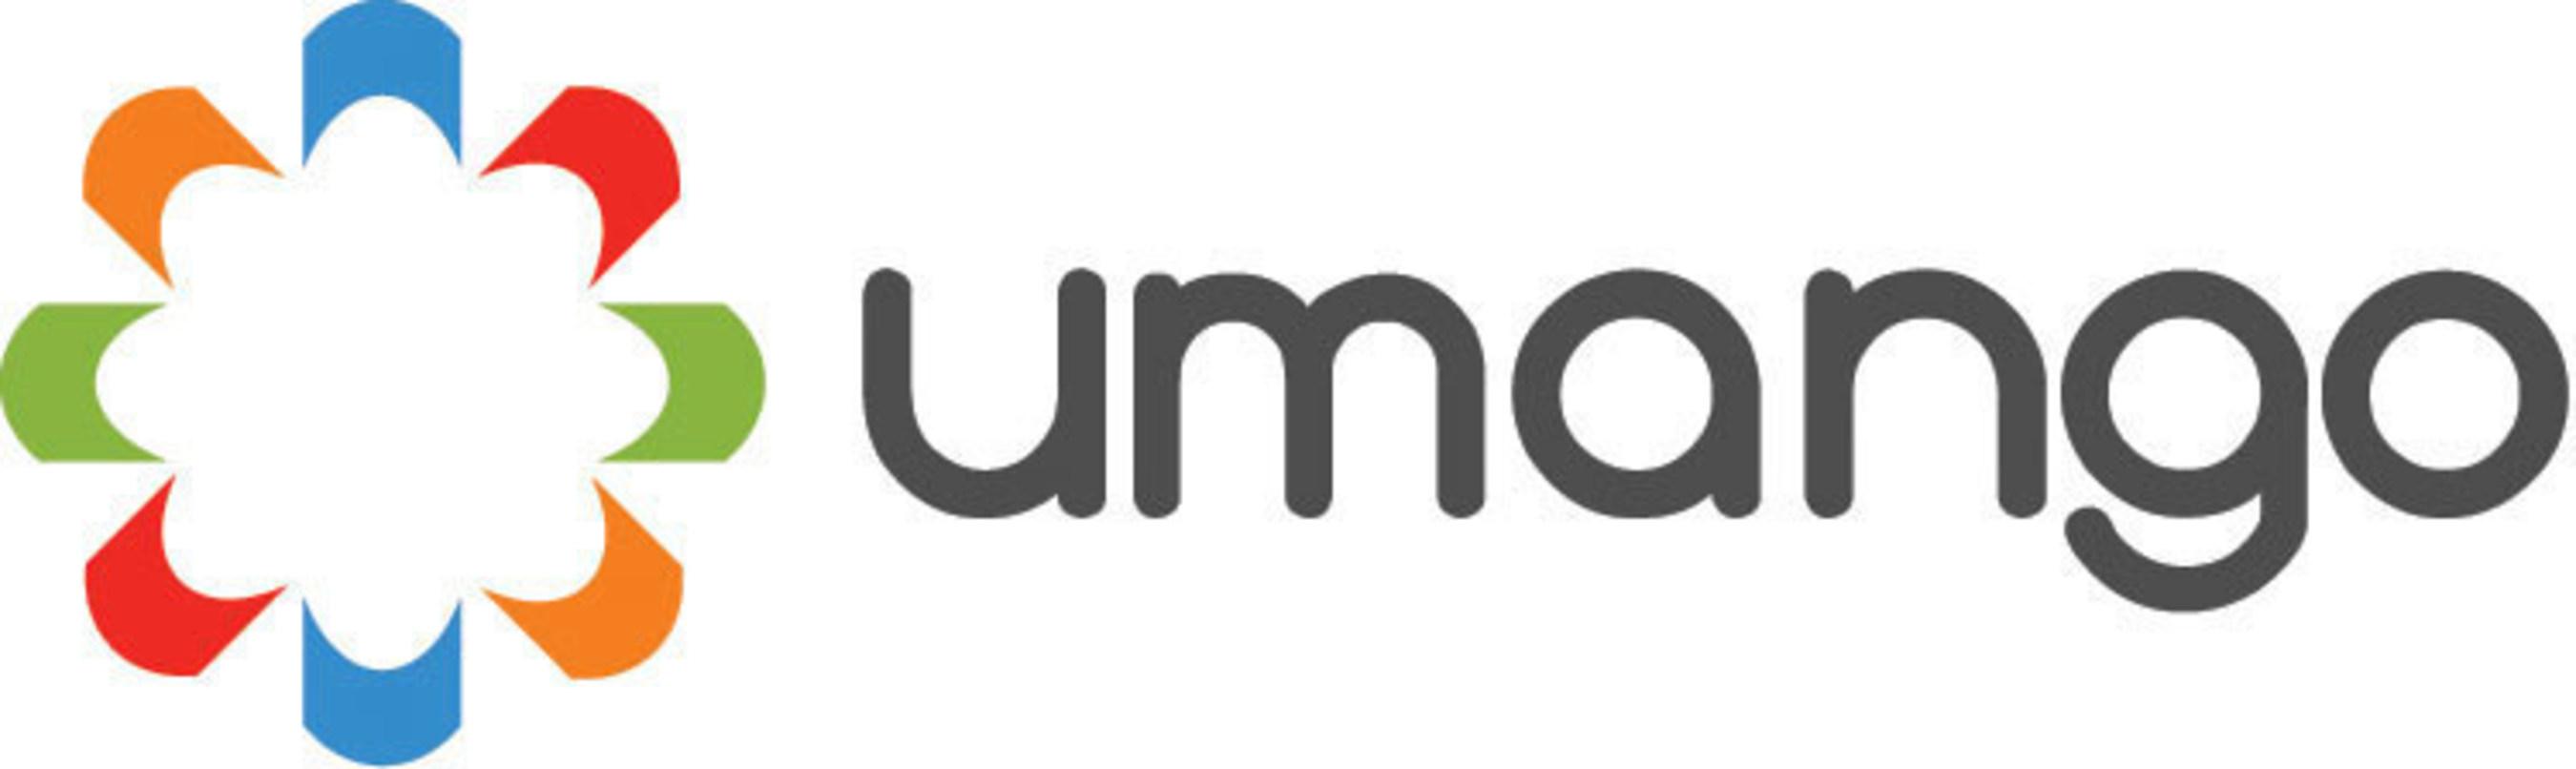 Sharp Welcomes Software Developer Umango To The Sharp Partner Program